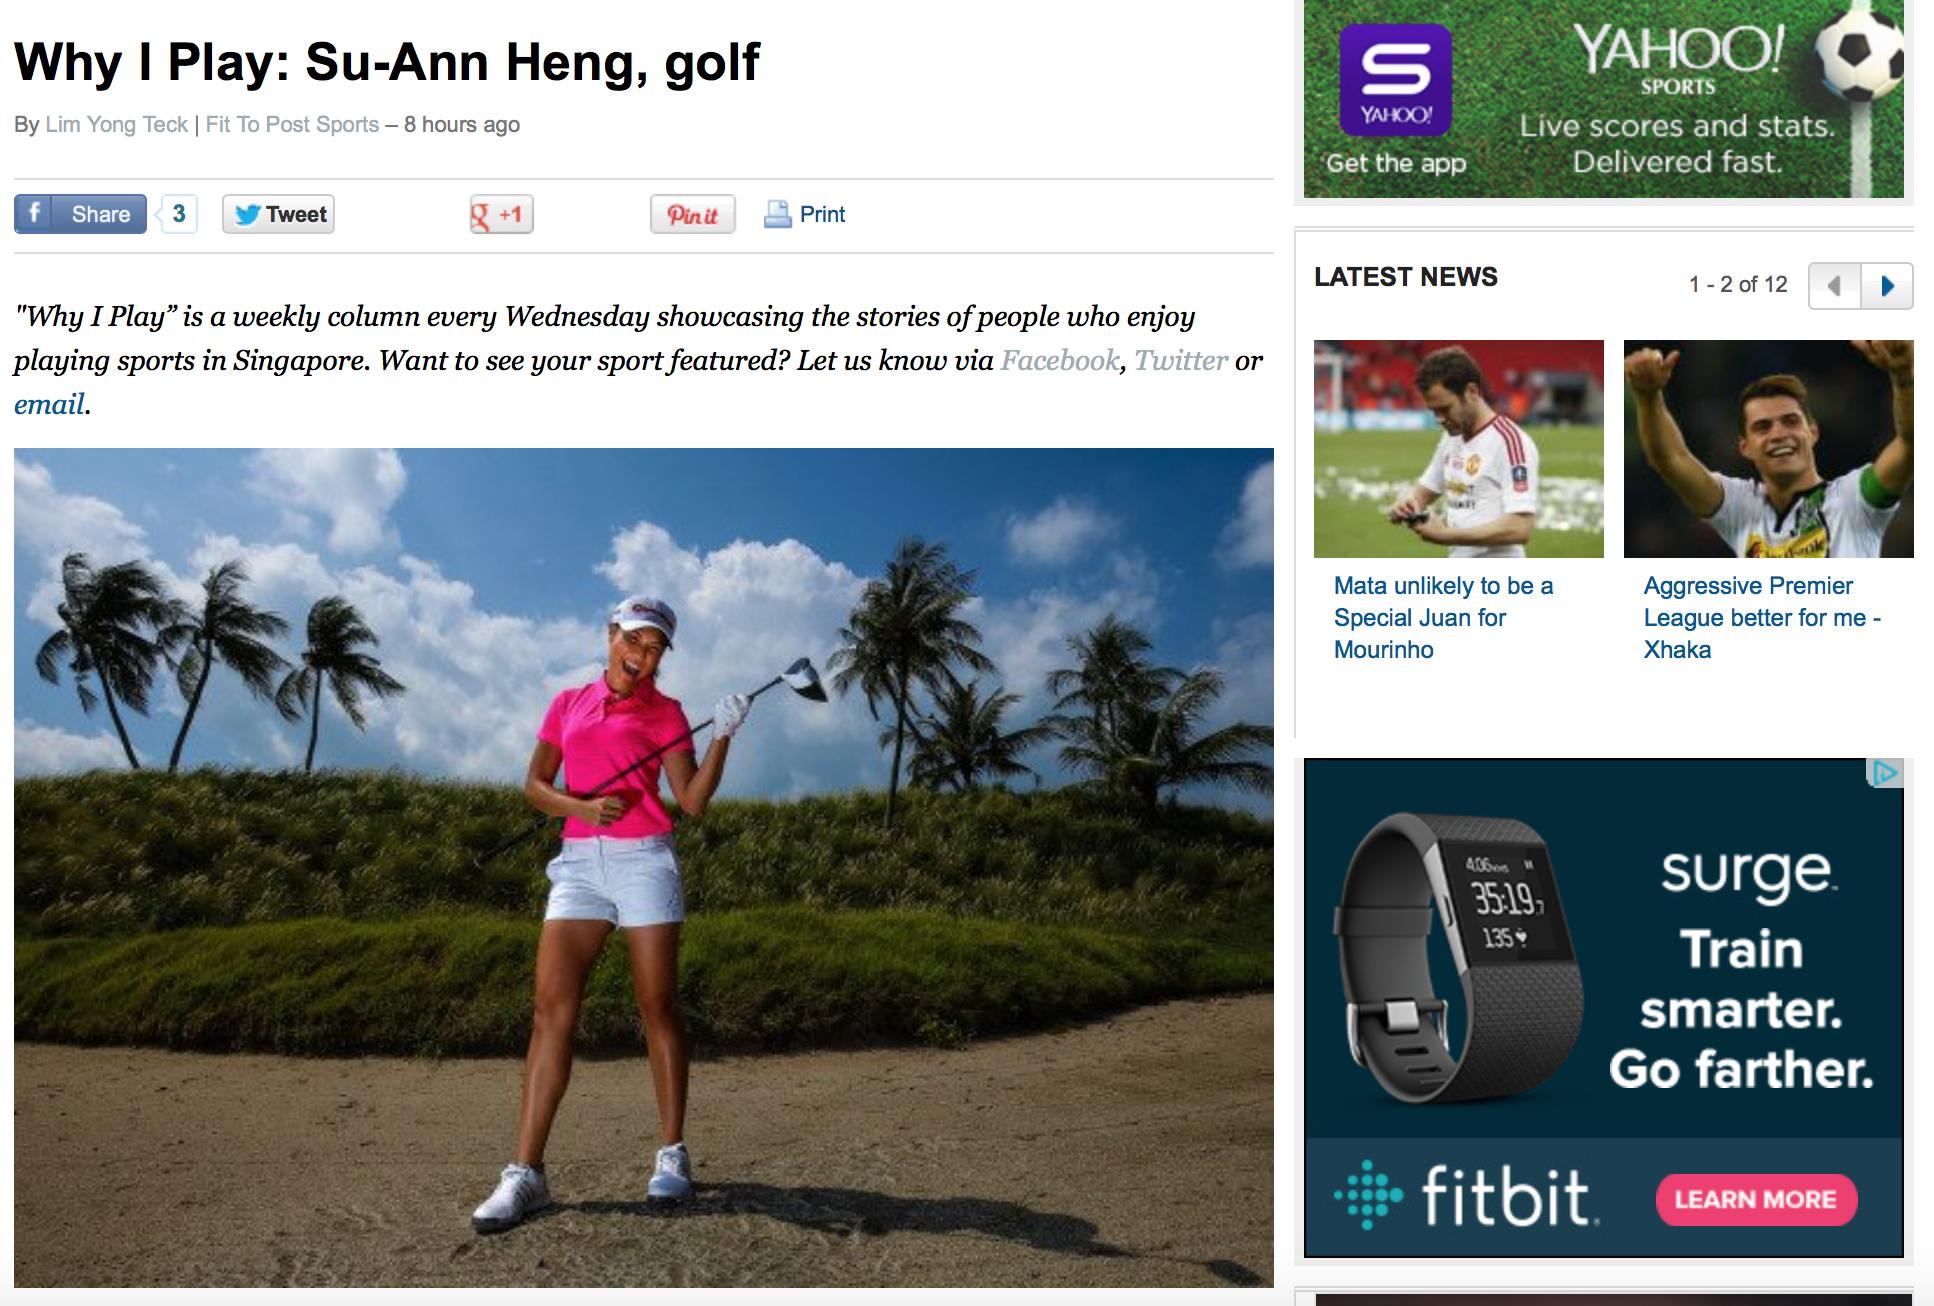 Su-Ann Heng feature for Yahoo! (www.yahoo.com)